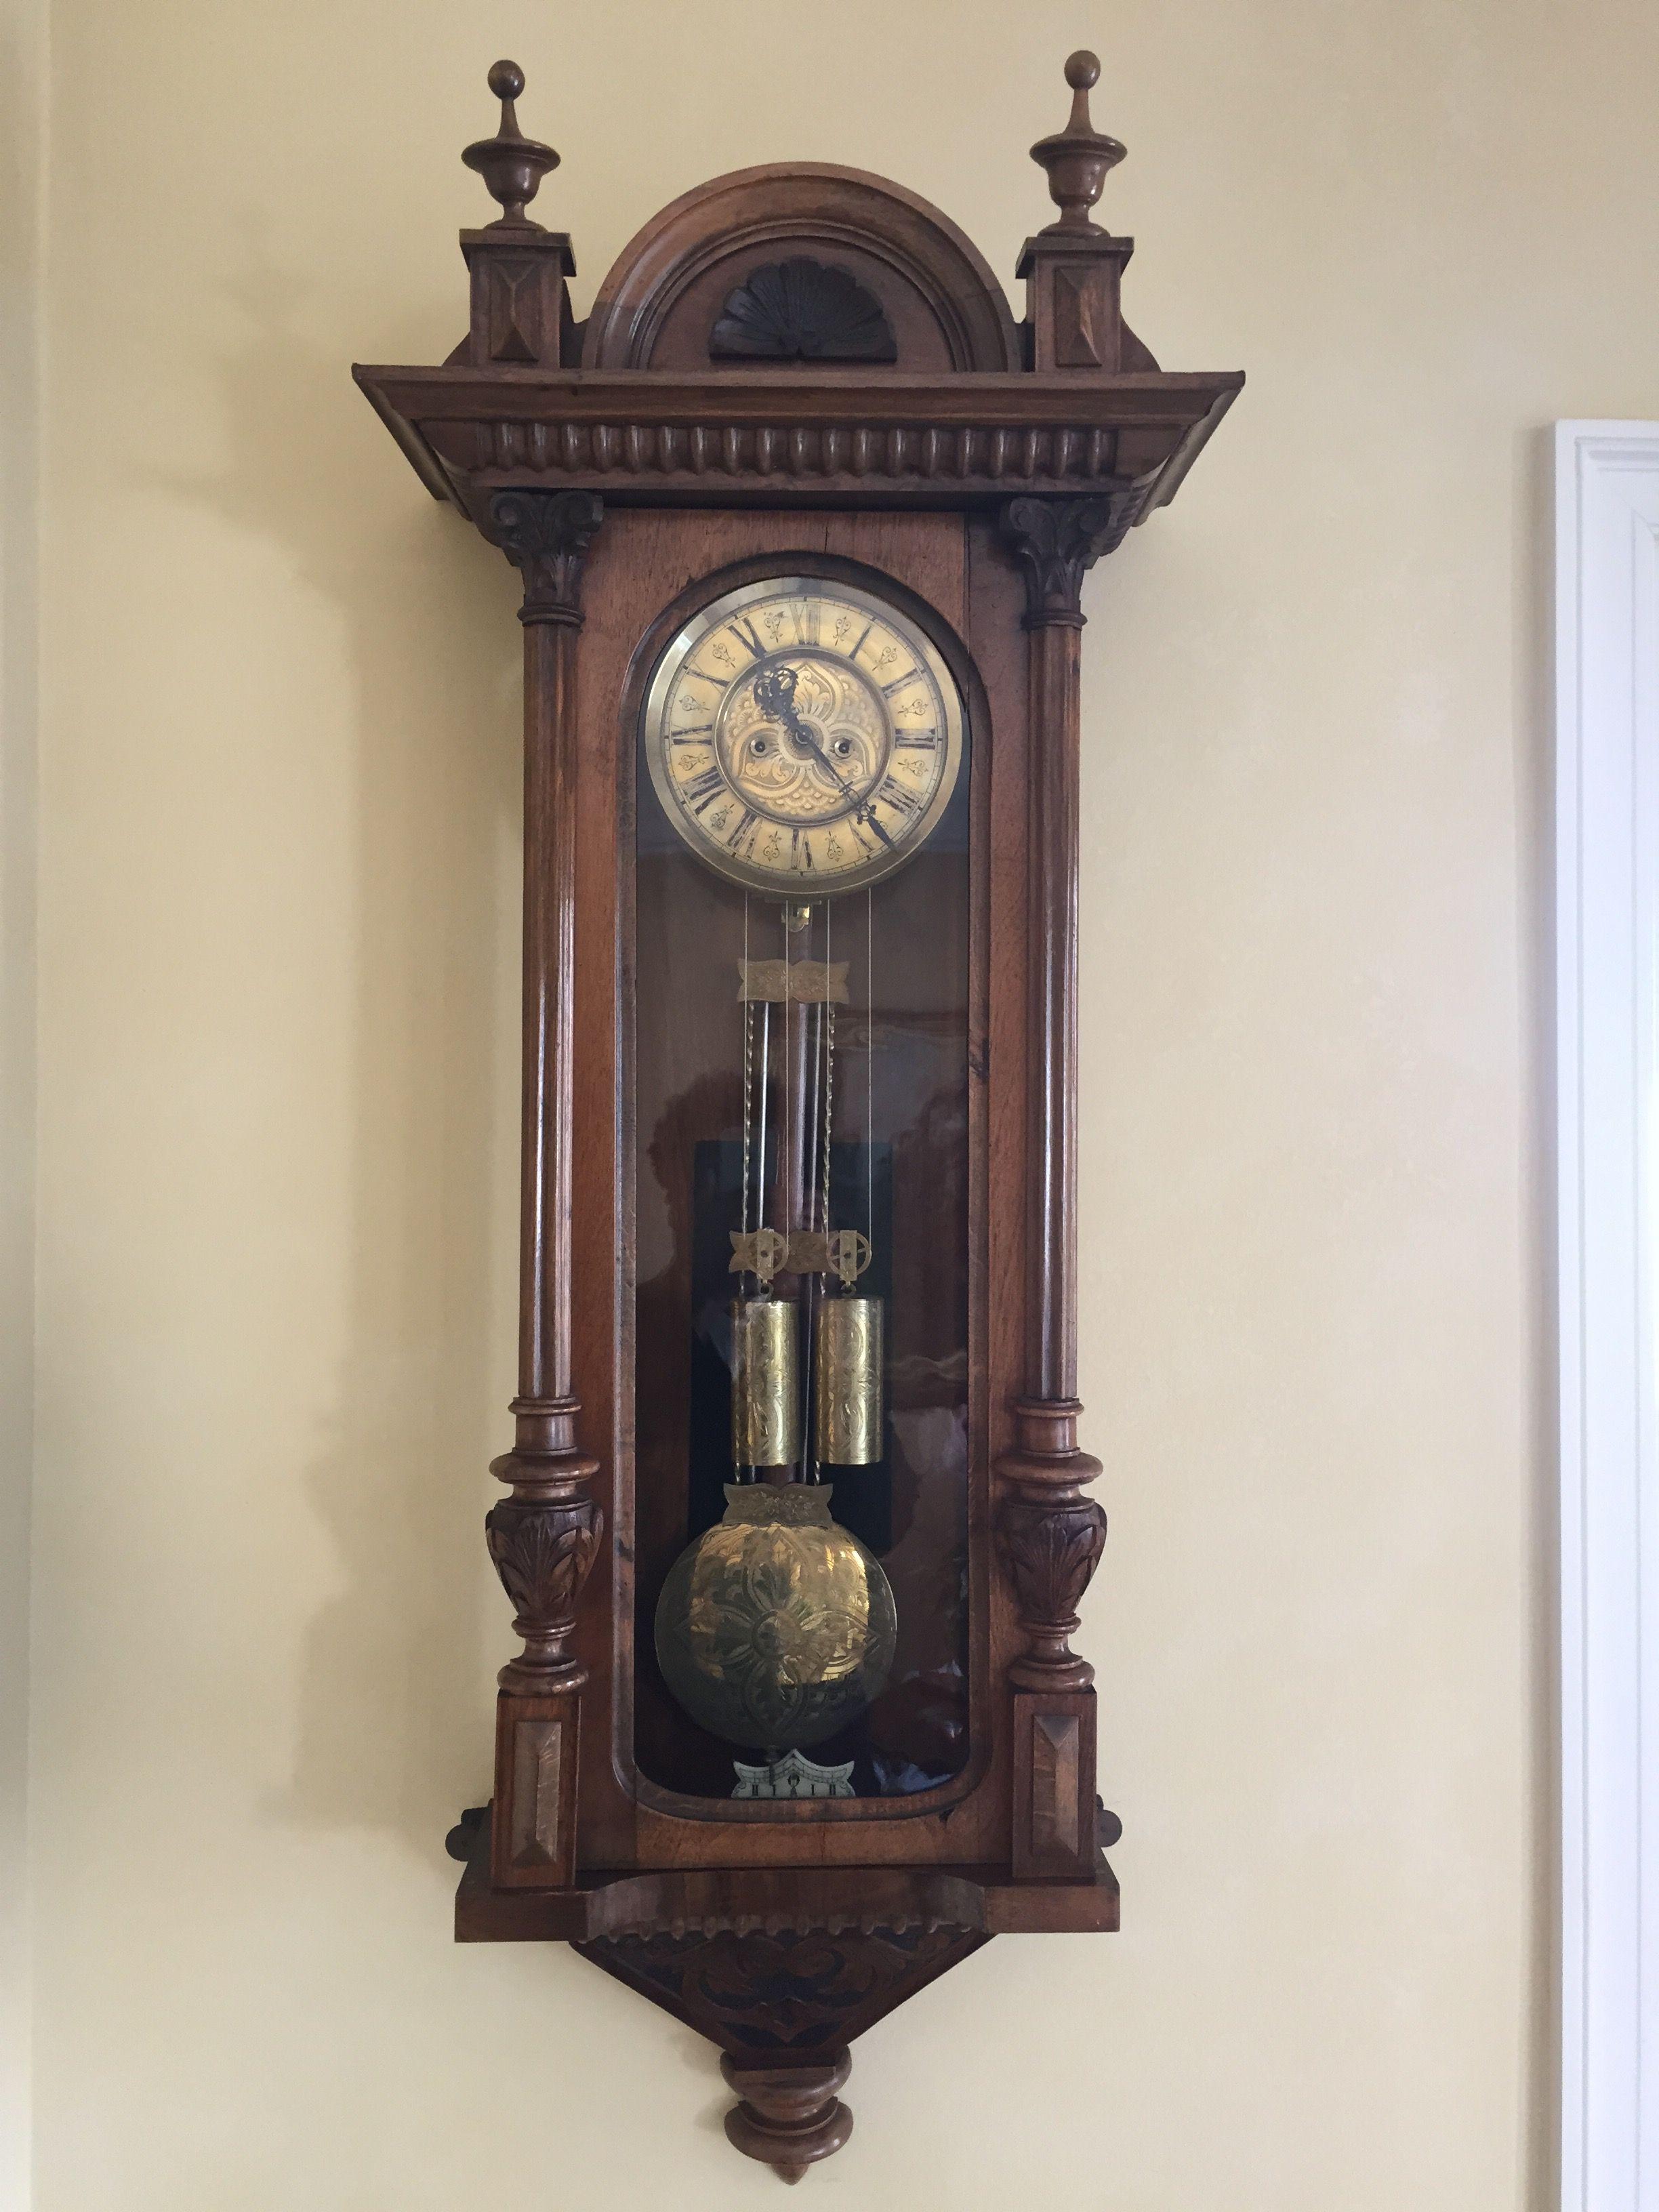 1800 S Gustav Becker Vienna Regulator Antikvarnye Chasy Chasy Antikvariat